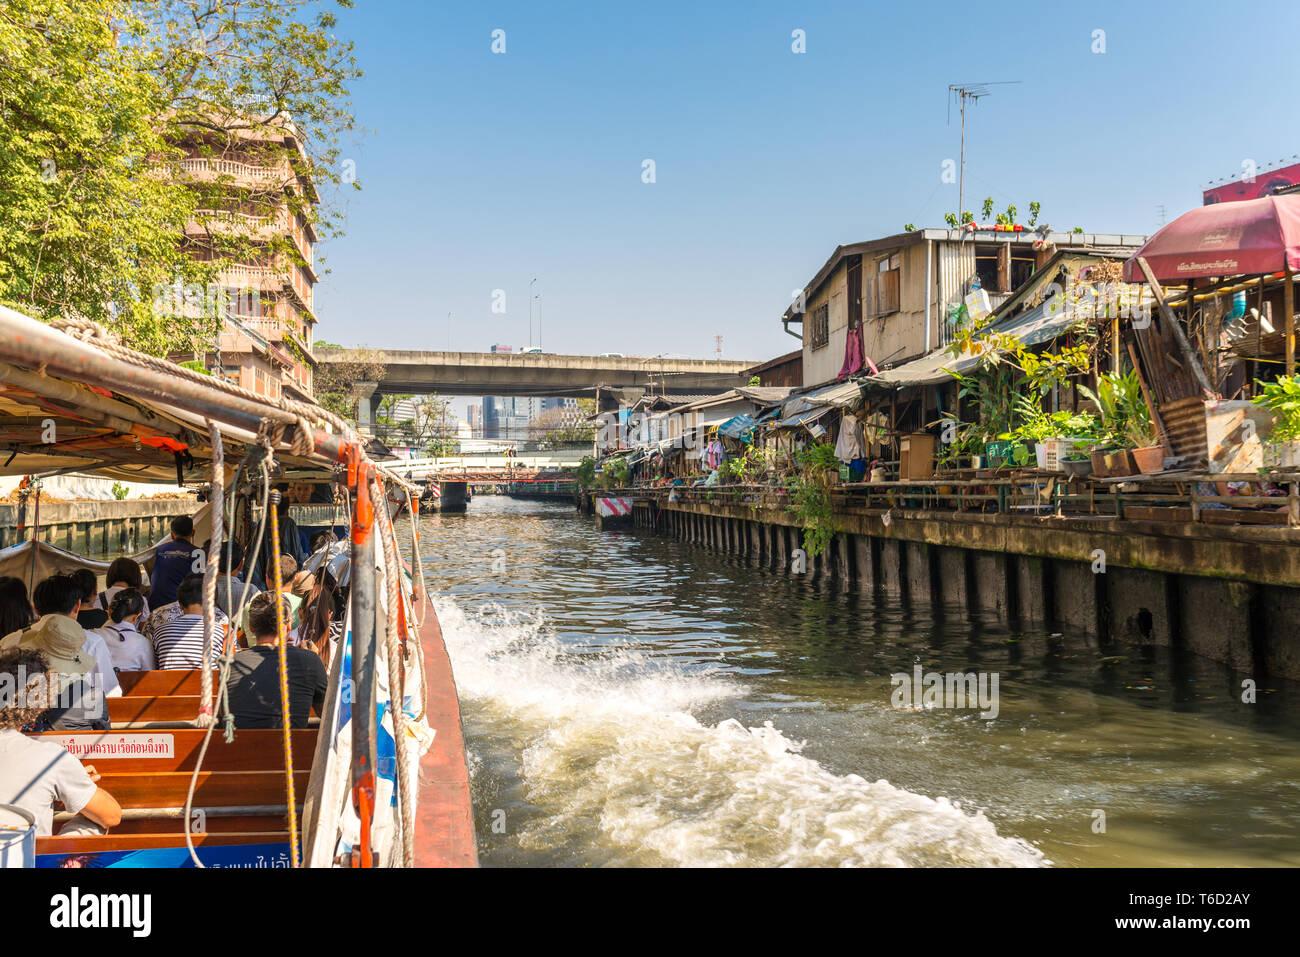 Express boat service on the Khlong Saen Saep in Bangkok Stock Photo